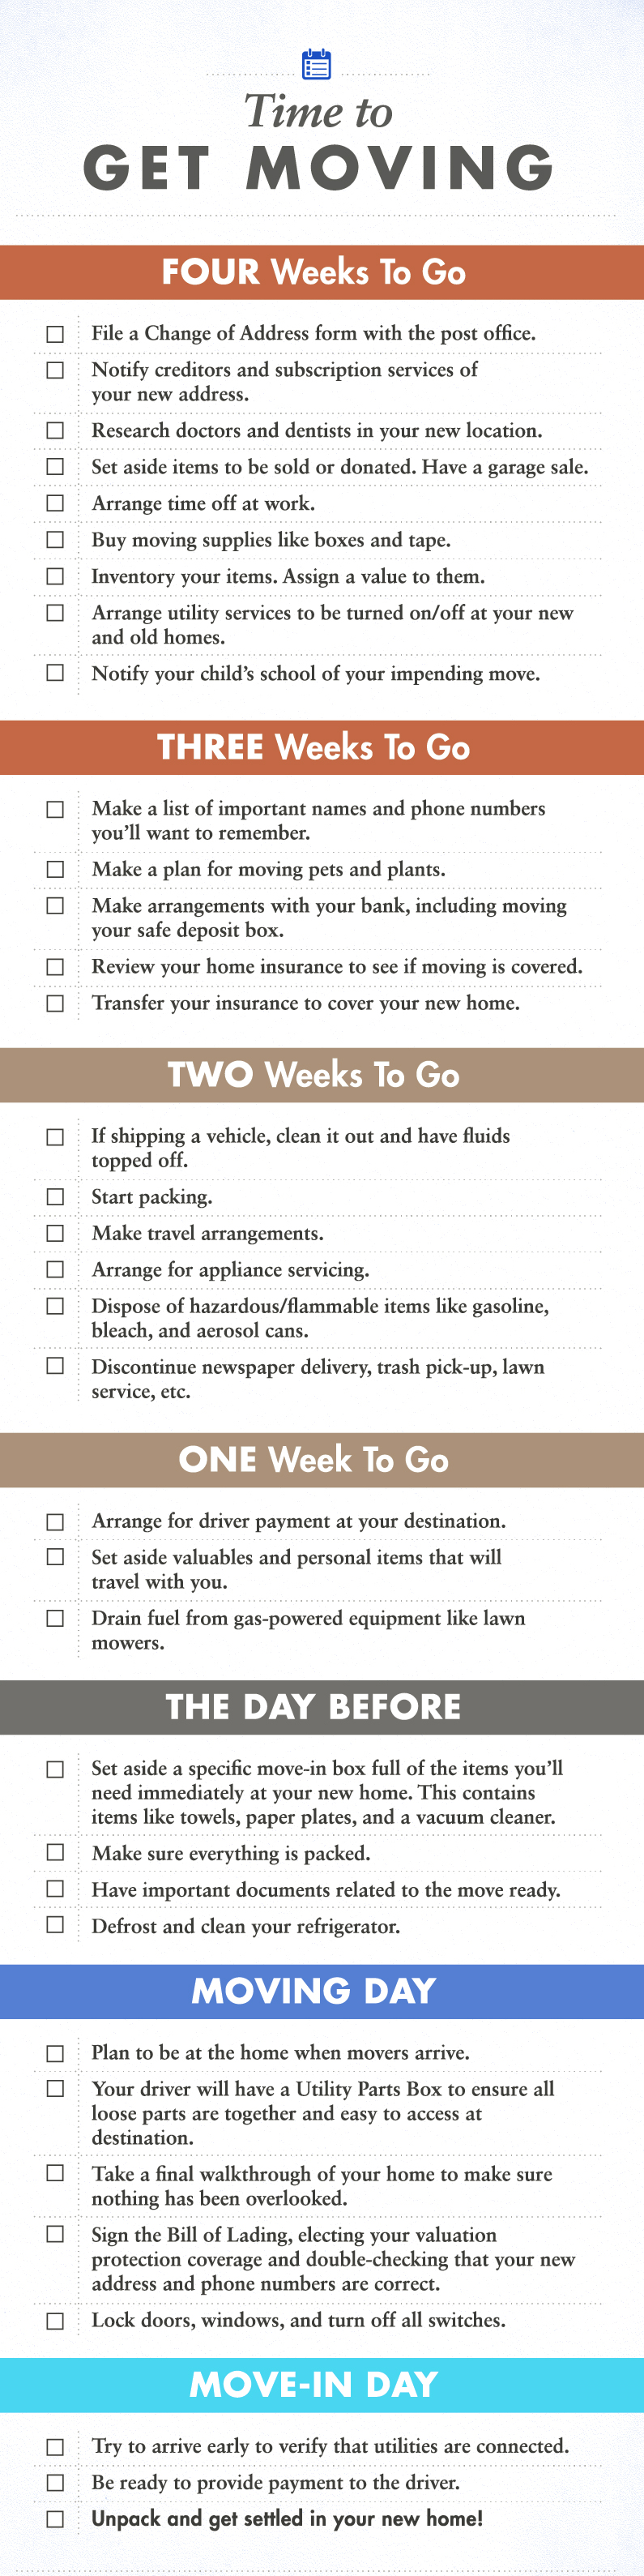 Moving-Checklist-Infographic-Florida Moving Checklist: 4 Week Countdown Orlando | Central Florida